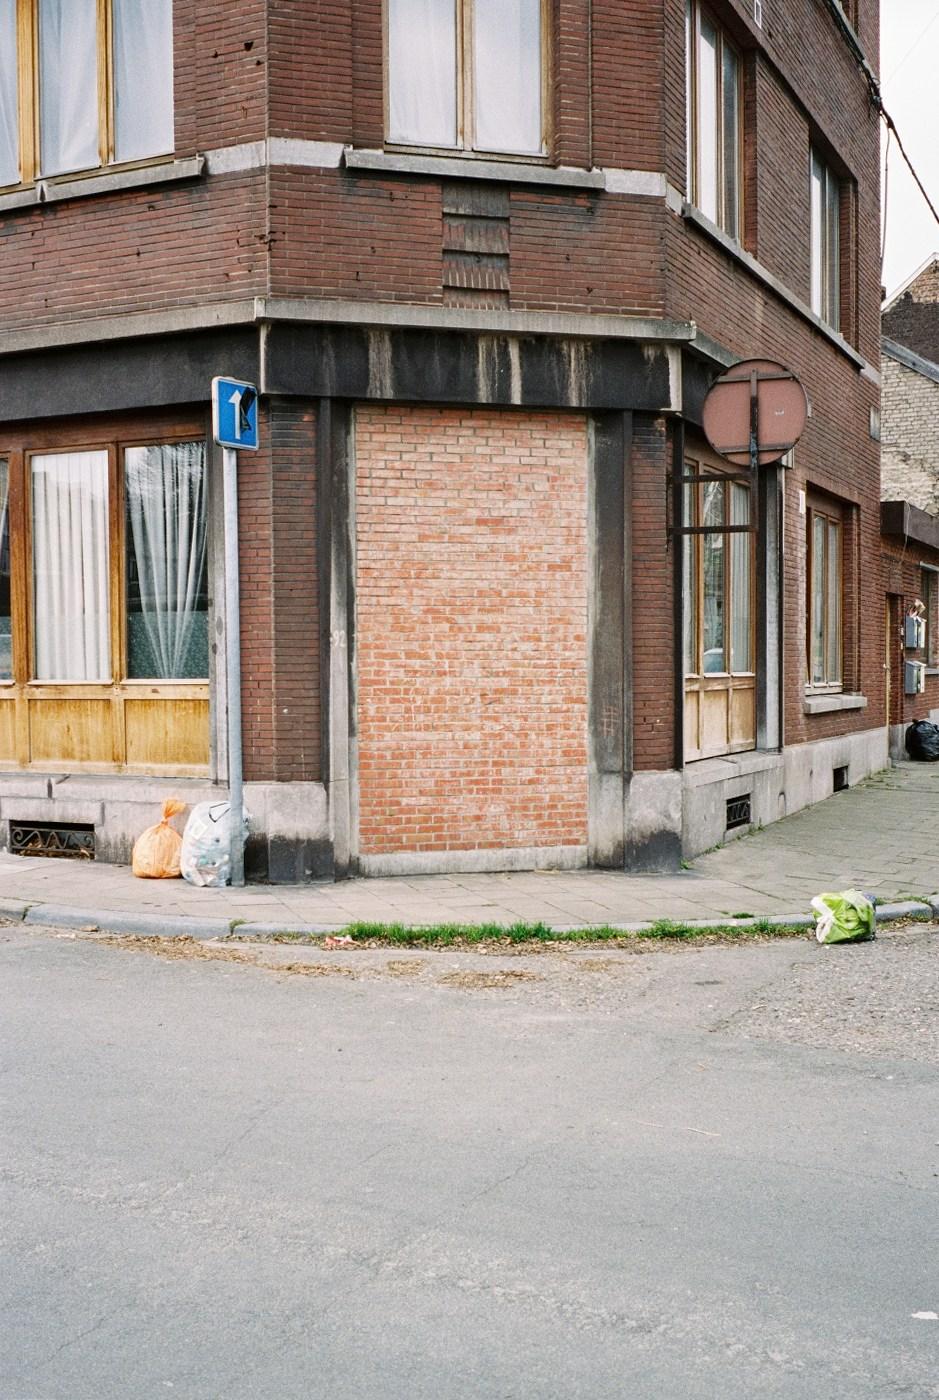 000036JoergBergs-KodakPortra400-MeinFilmLab-M7-35 (2)